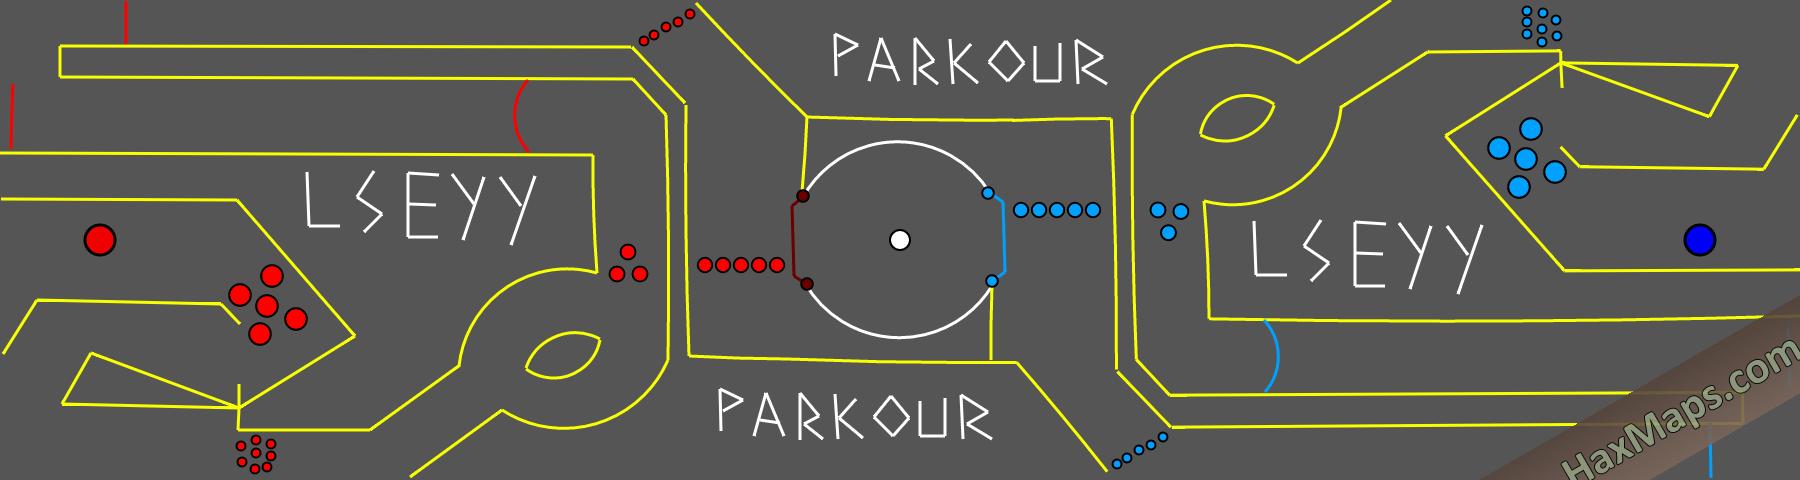 hax ball maps | Parkour Lseyy 1